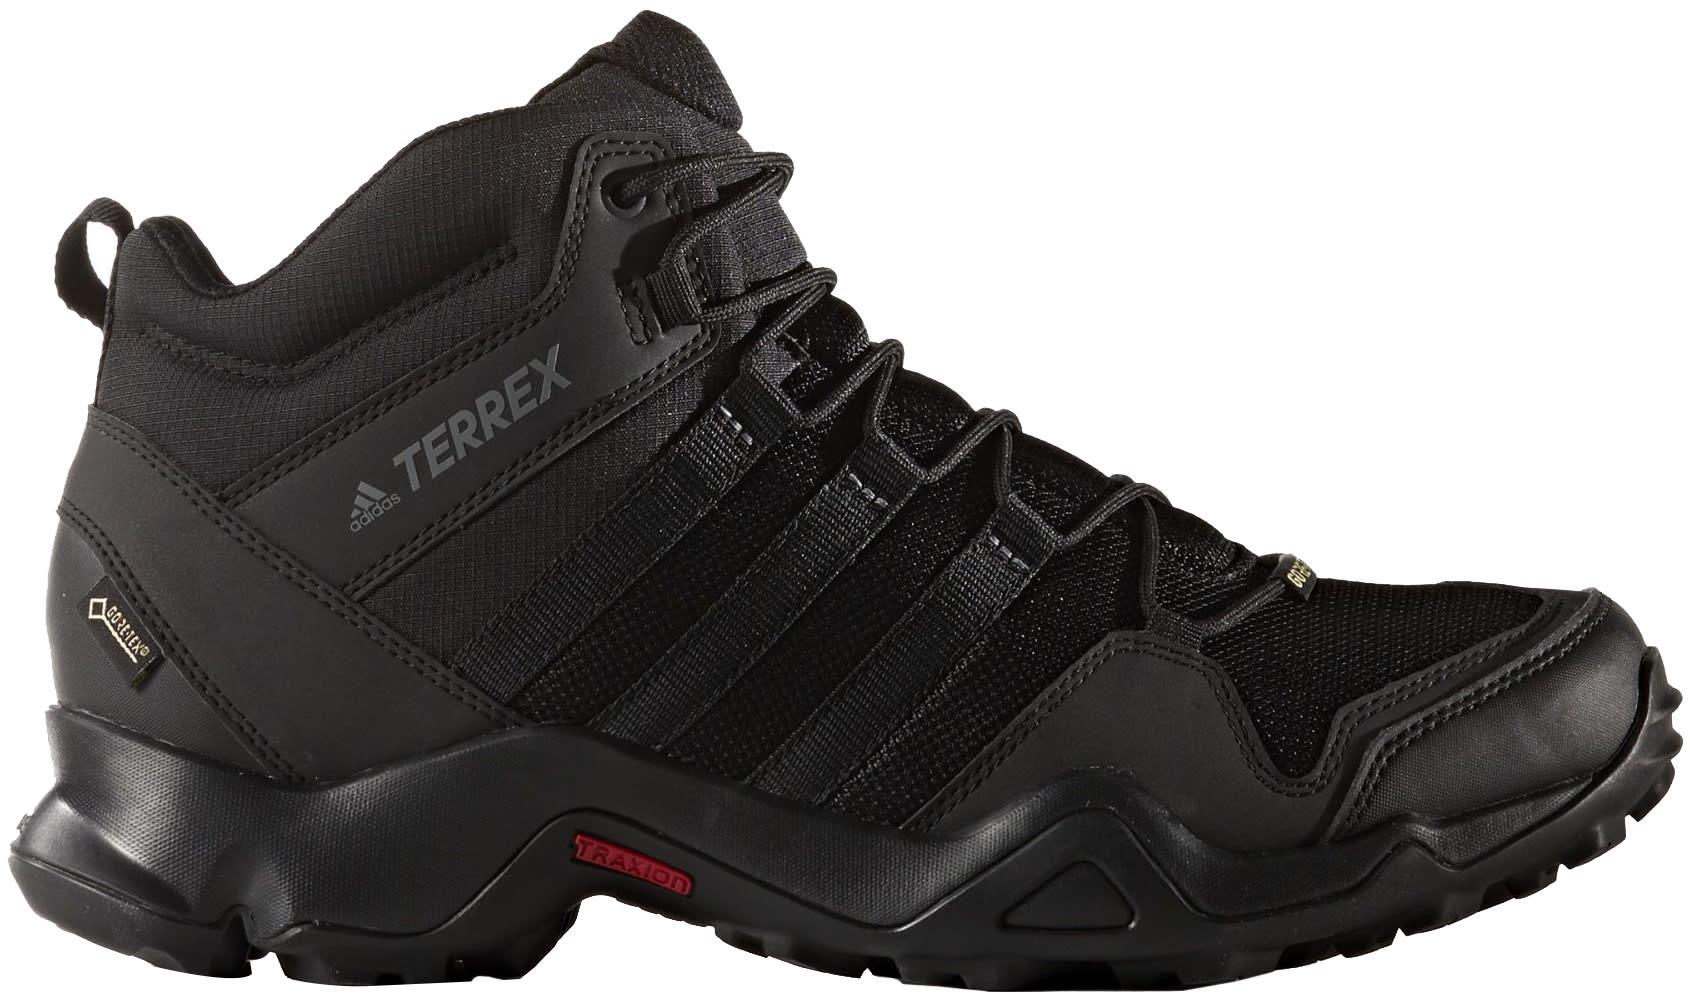 Adidas Terrex Ax2r Mid Gtx Hiking Boots